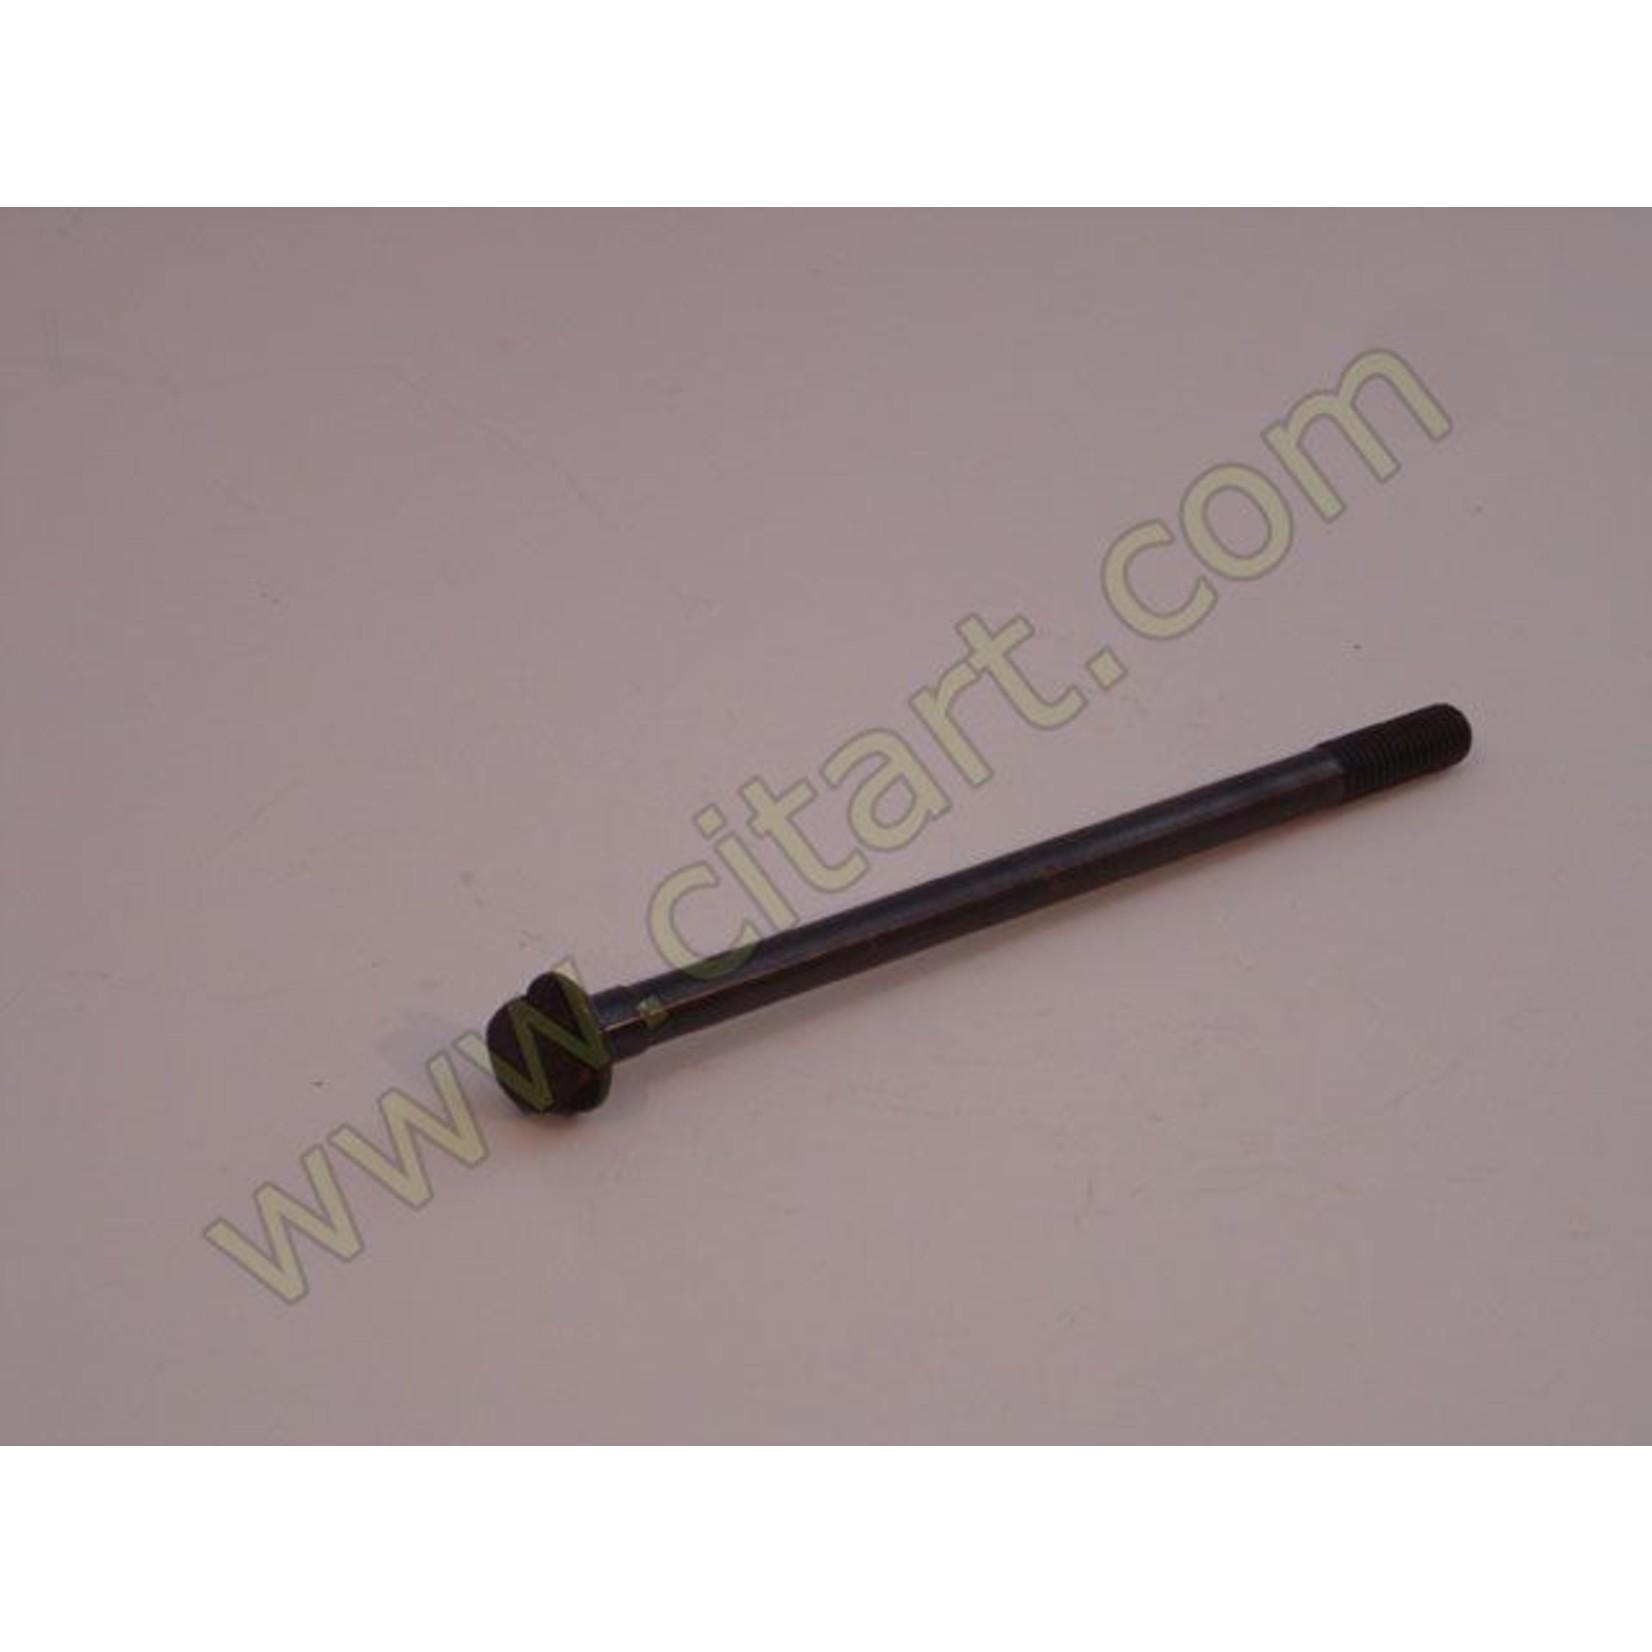 Inlet cylinder head screw Nr Org: 5411687